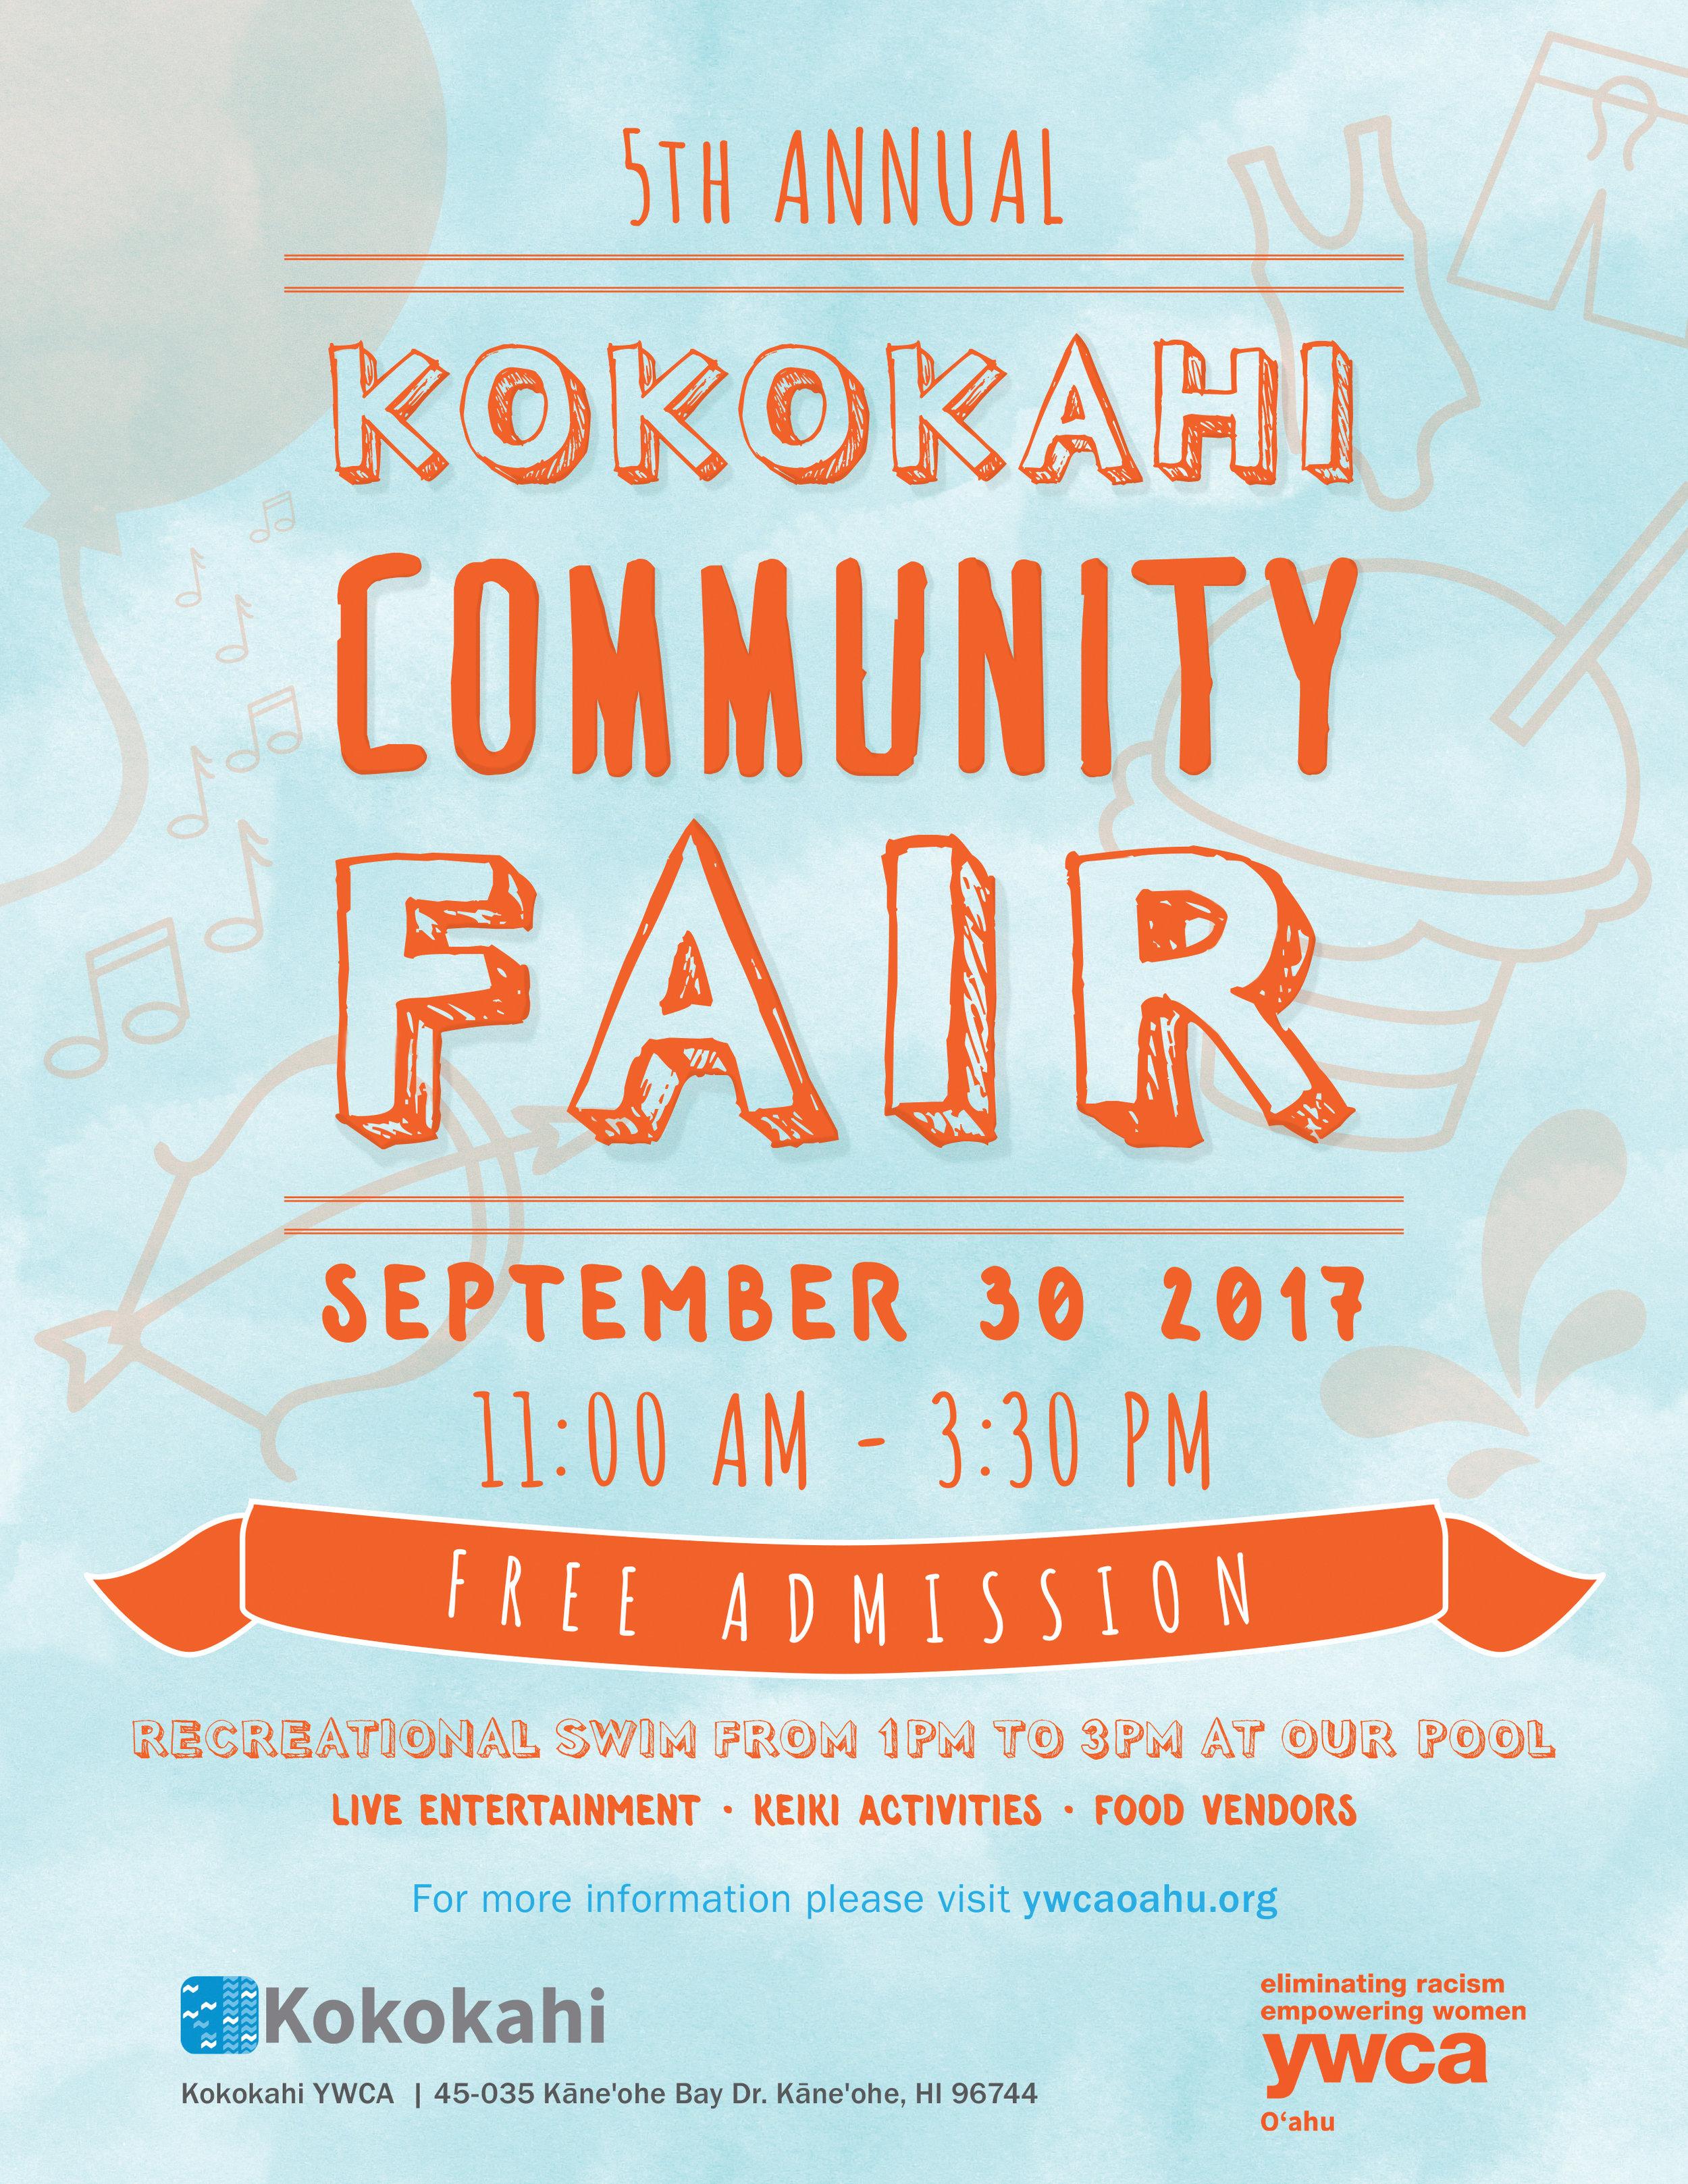 2017 Kokokahi Community Fair flyer PS.jpg